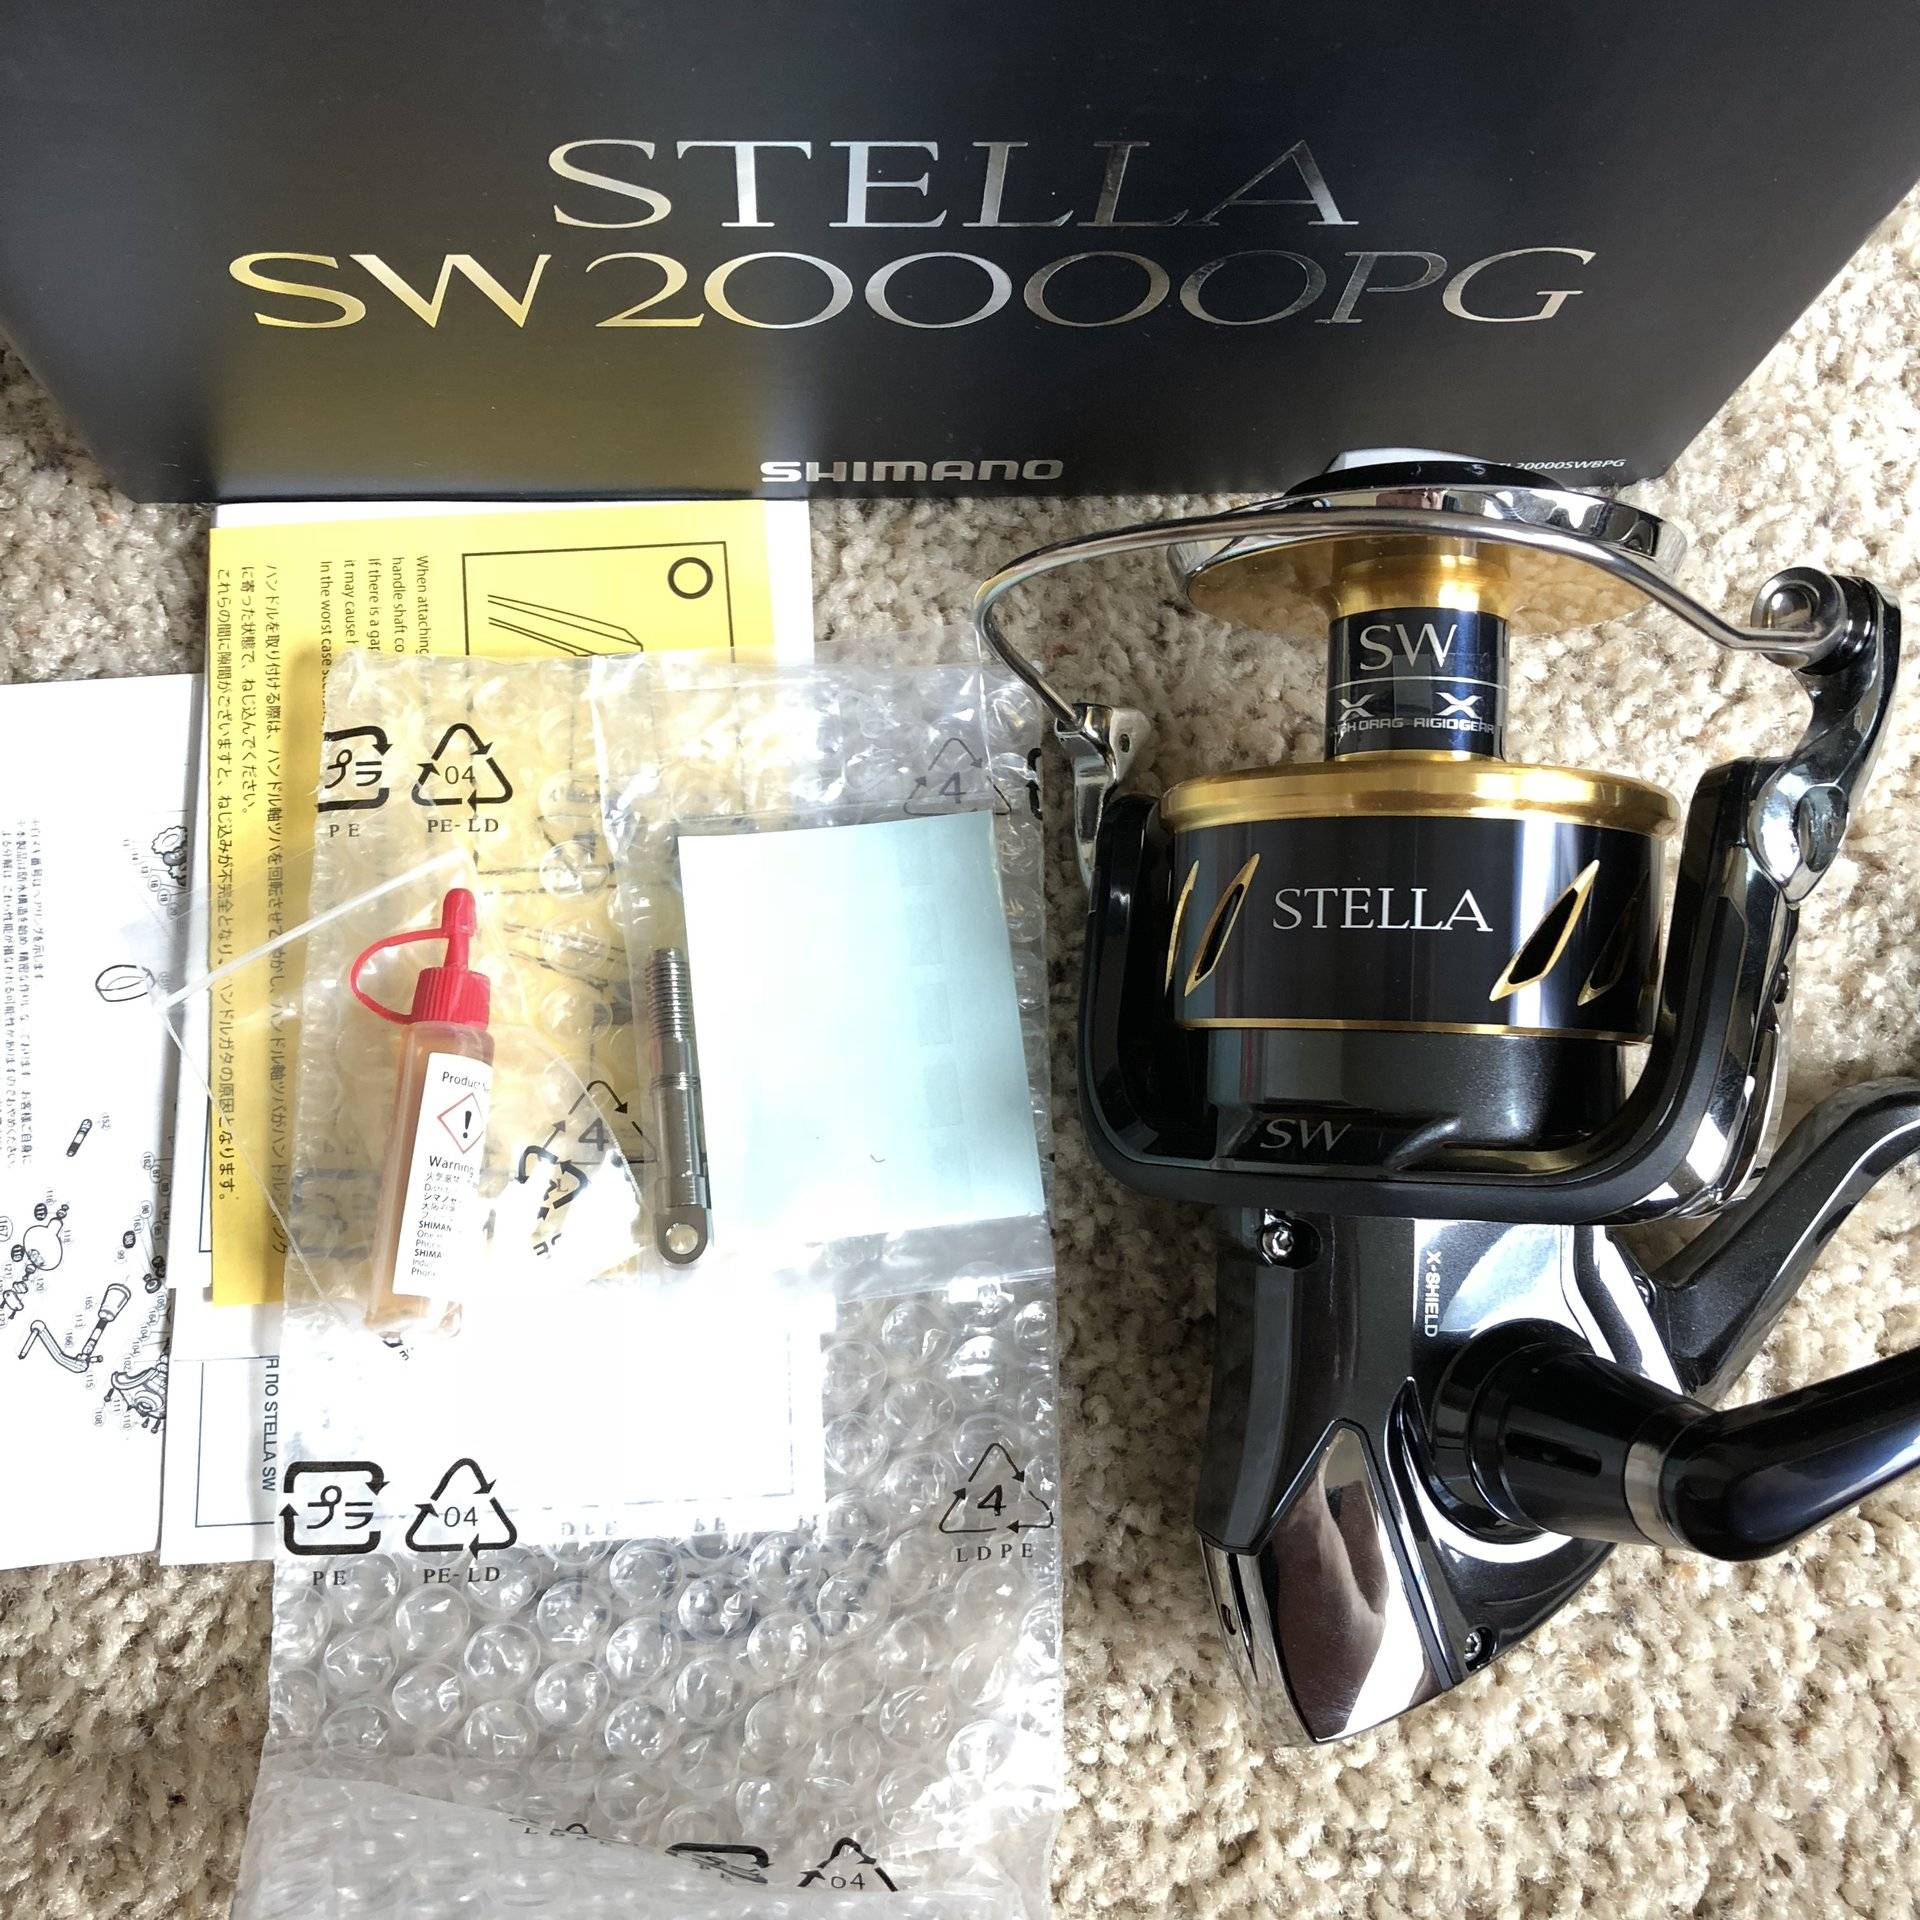 For Sale - Shimano Stella 20000 SW *NIB* latest model